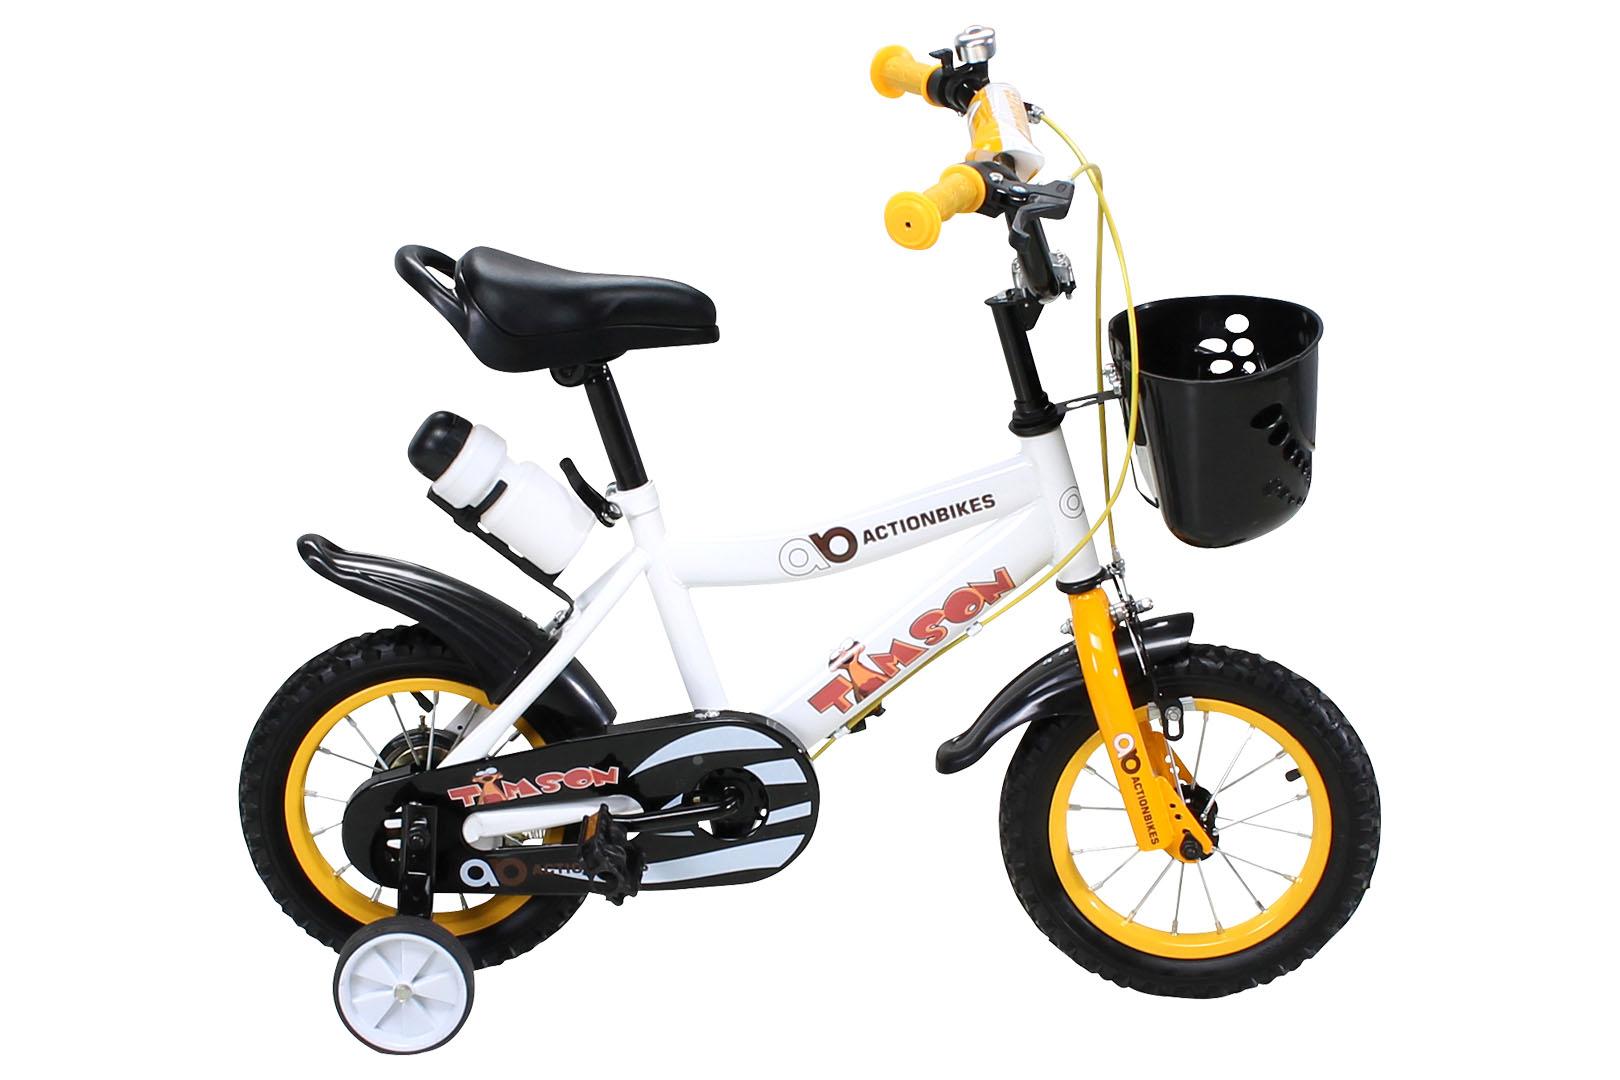 quadfactory bottrop kinder fahrrad 12 zoll. Black Bedroom Furniture Sets. Home Design Ideas